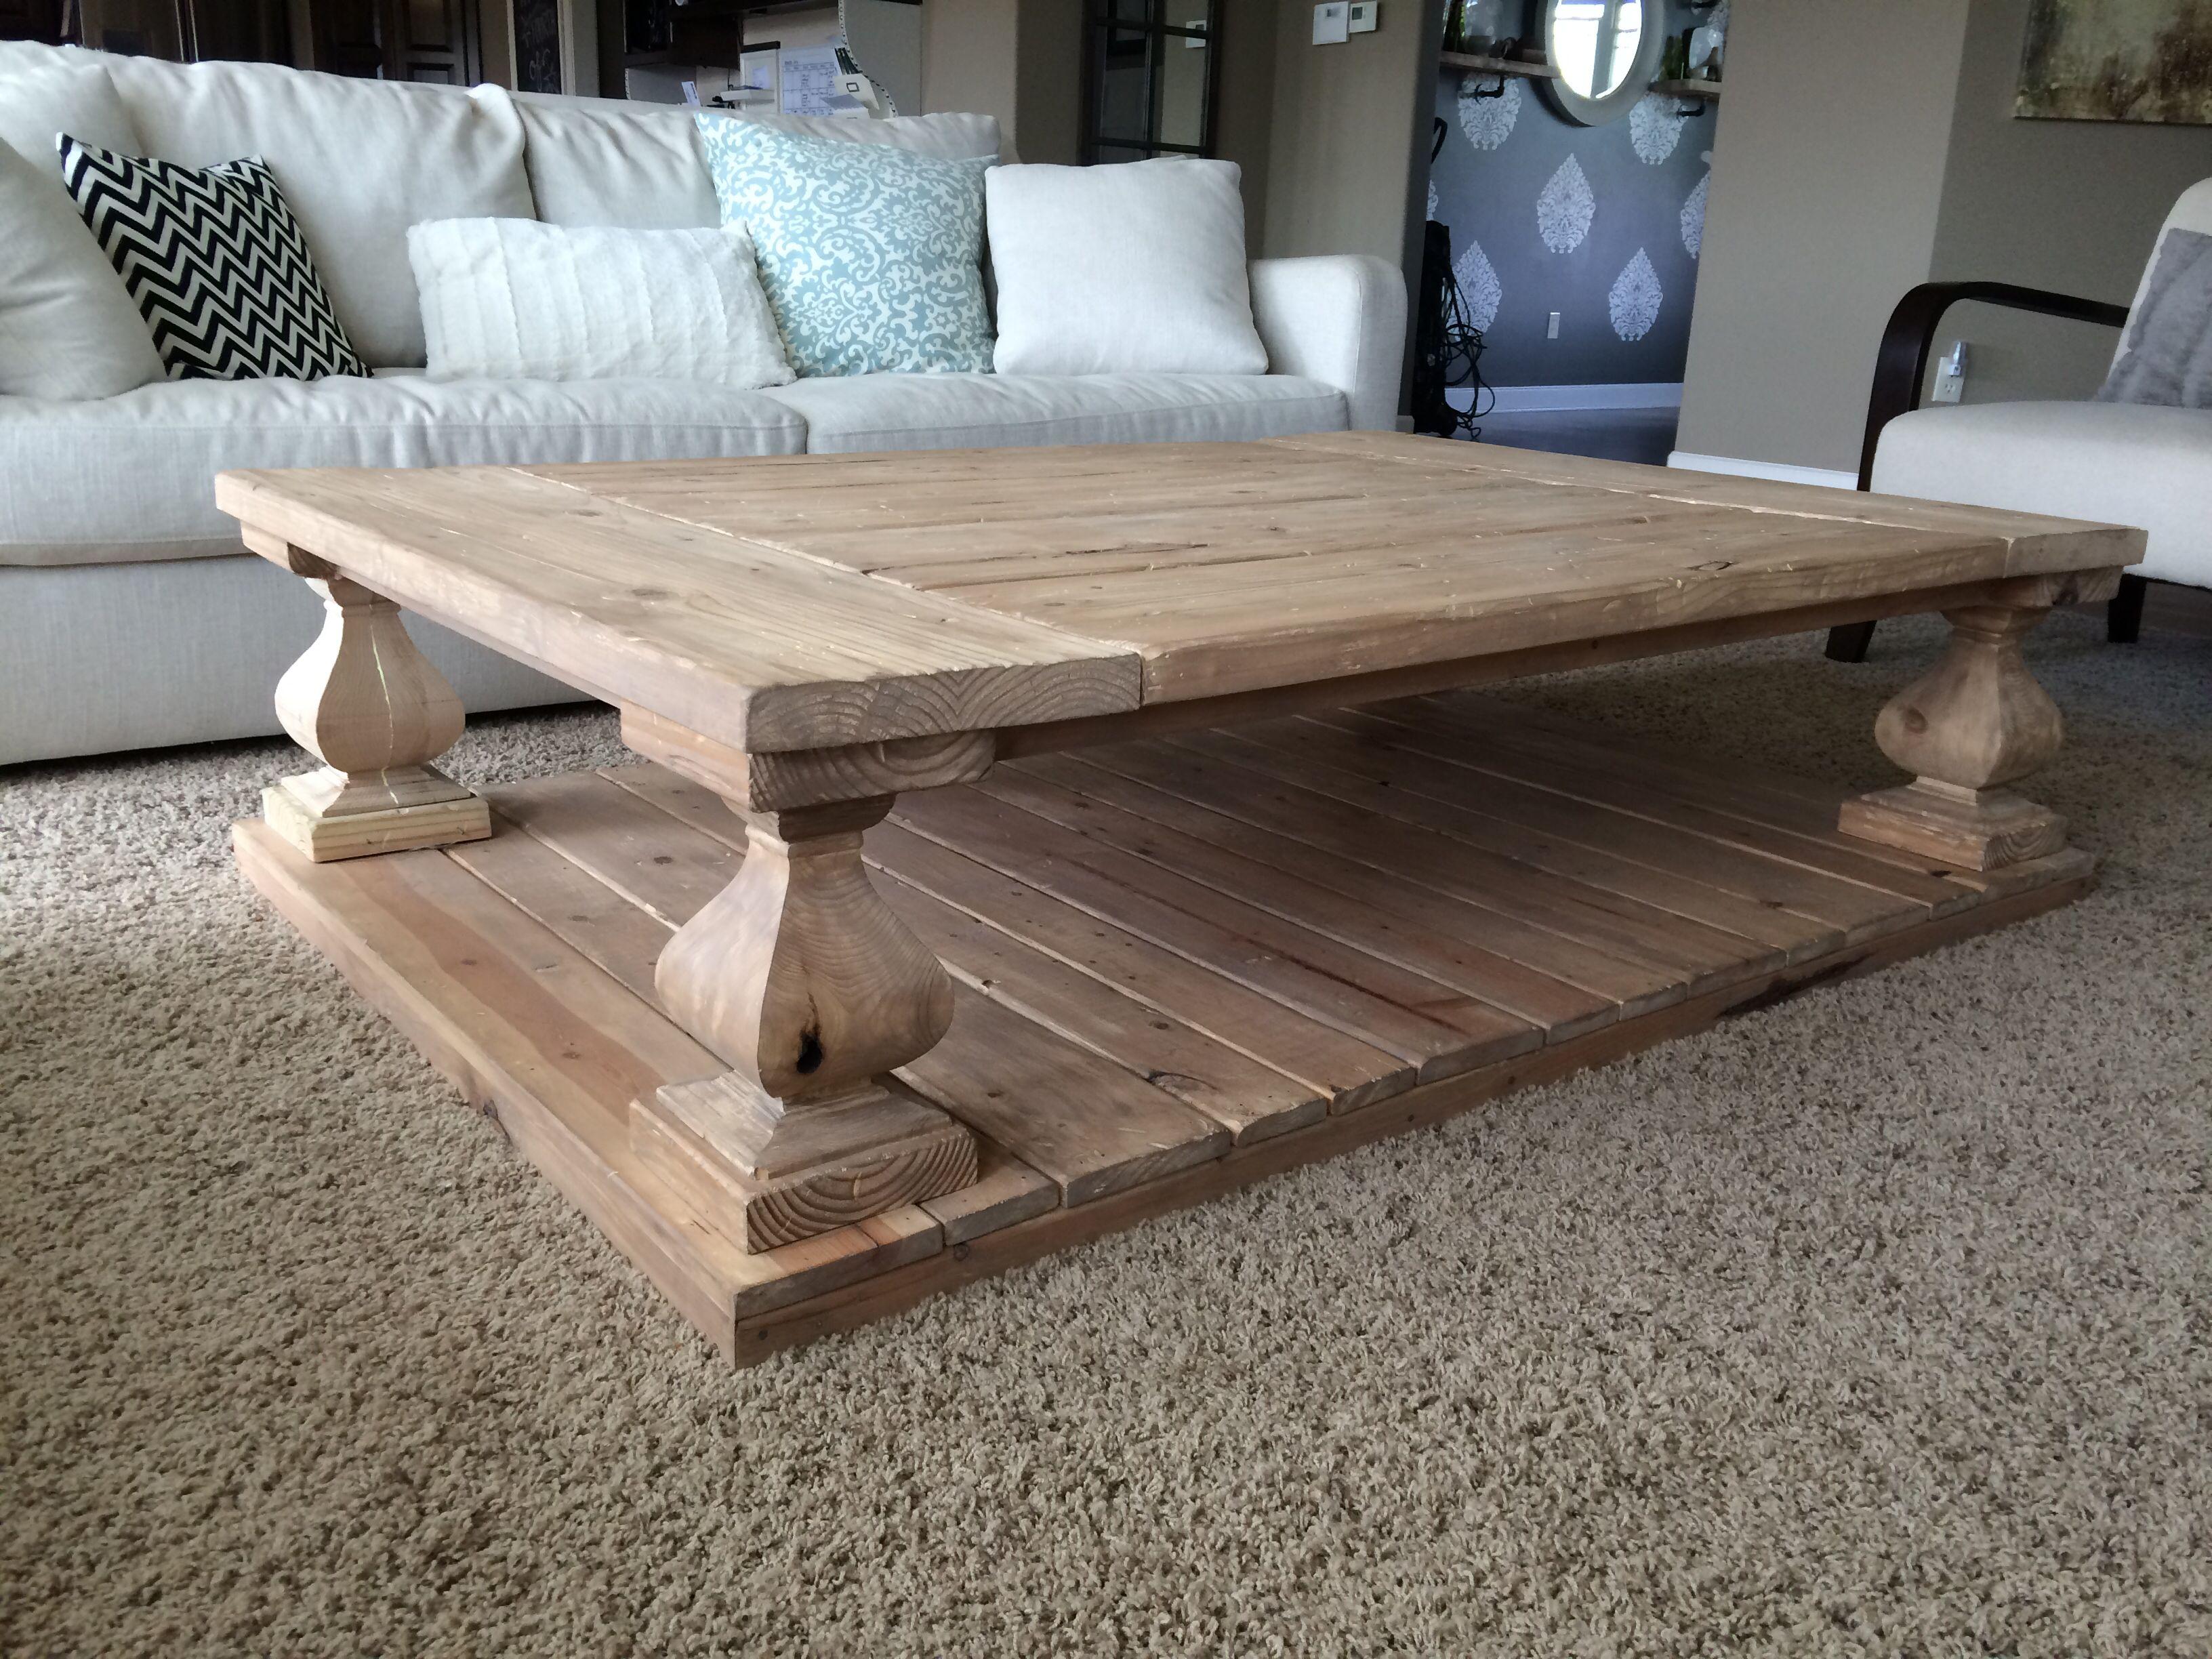 Knockoff rh coffee table i built coffee table coffee